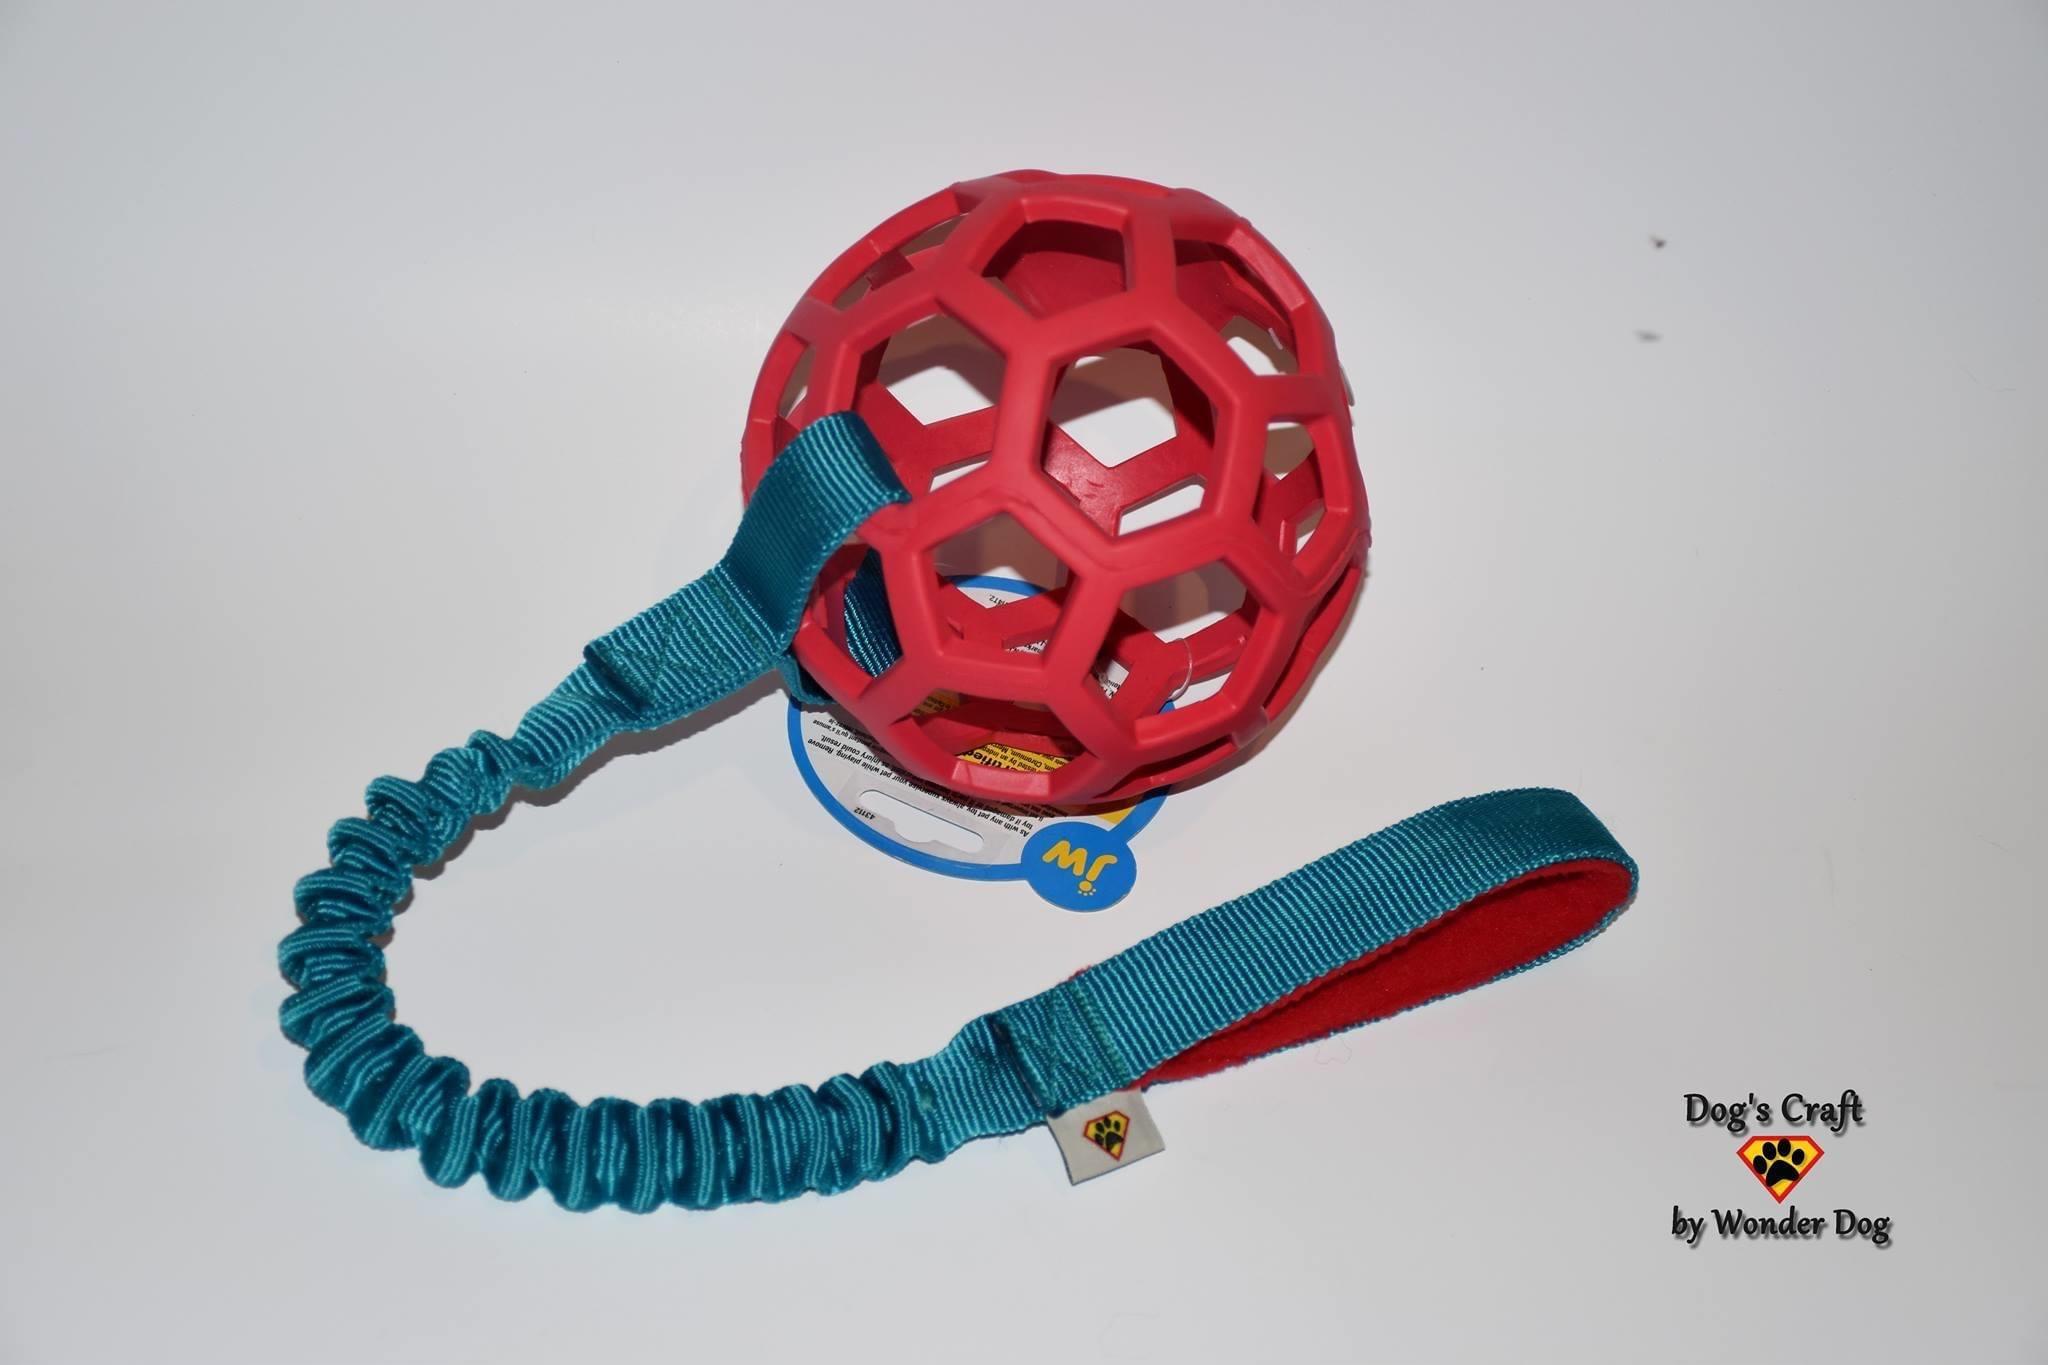 Dog's Craft Dog's Craft Hollee Basic S